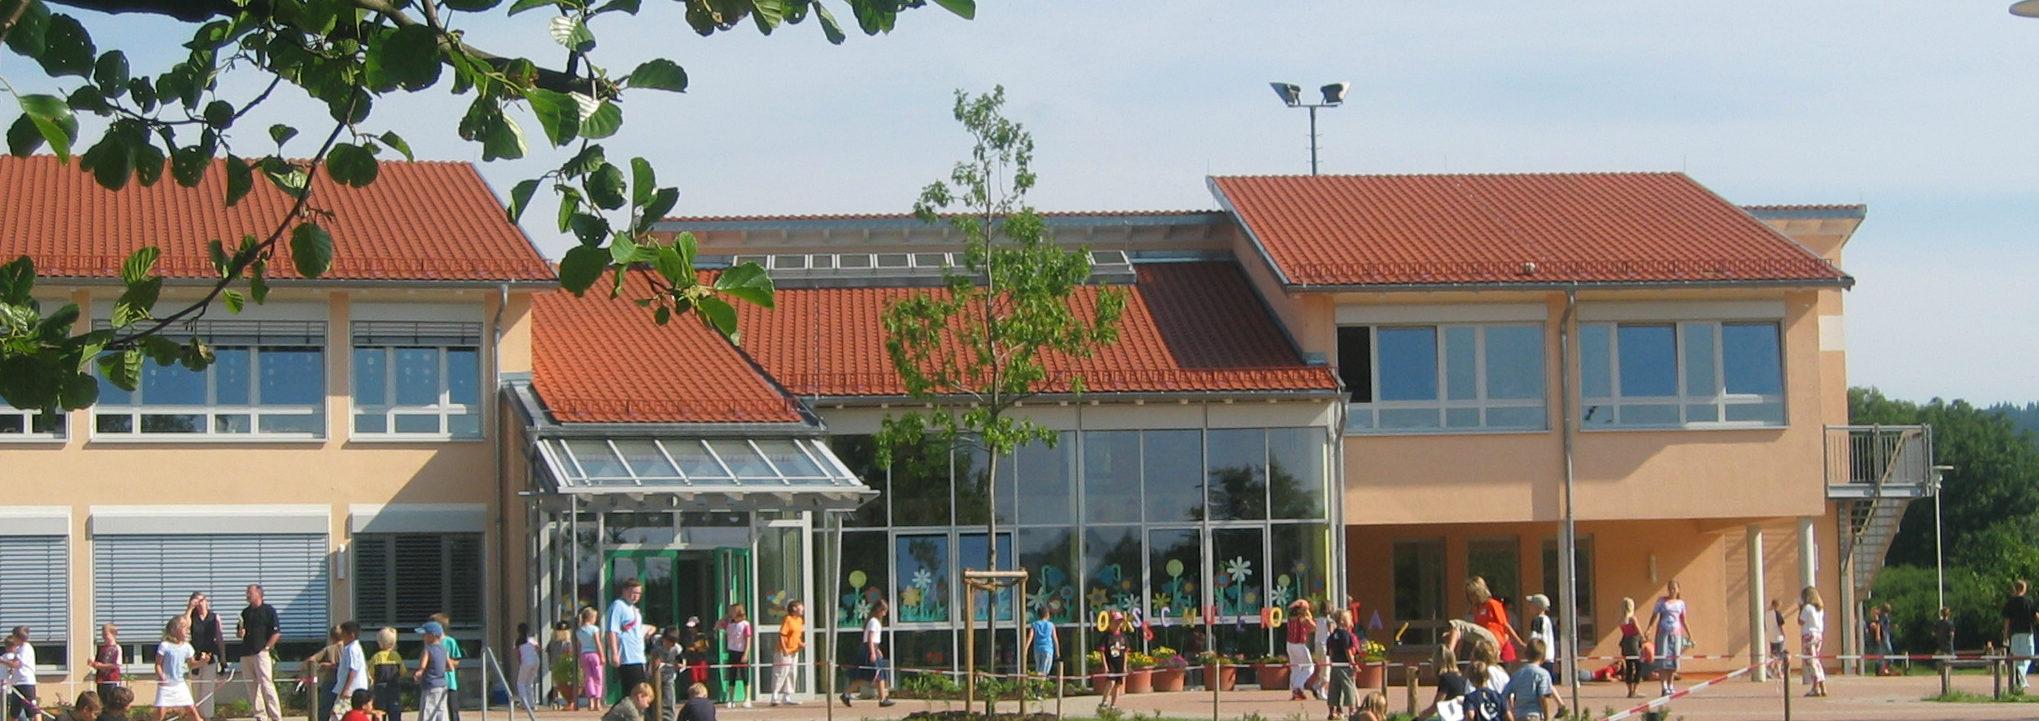 Pausenhof